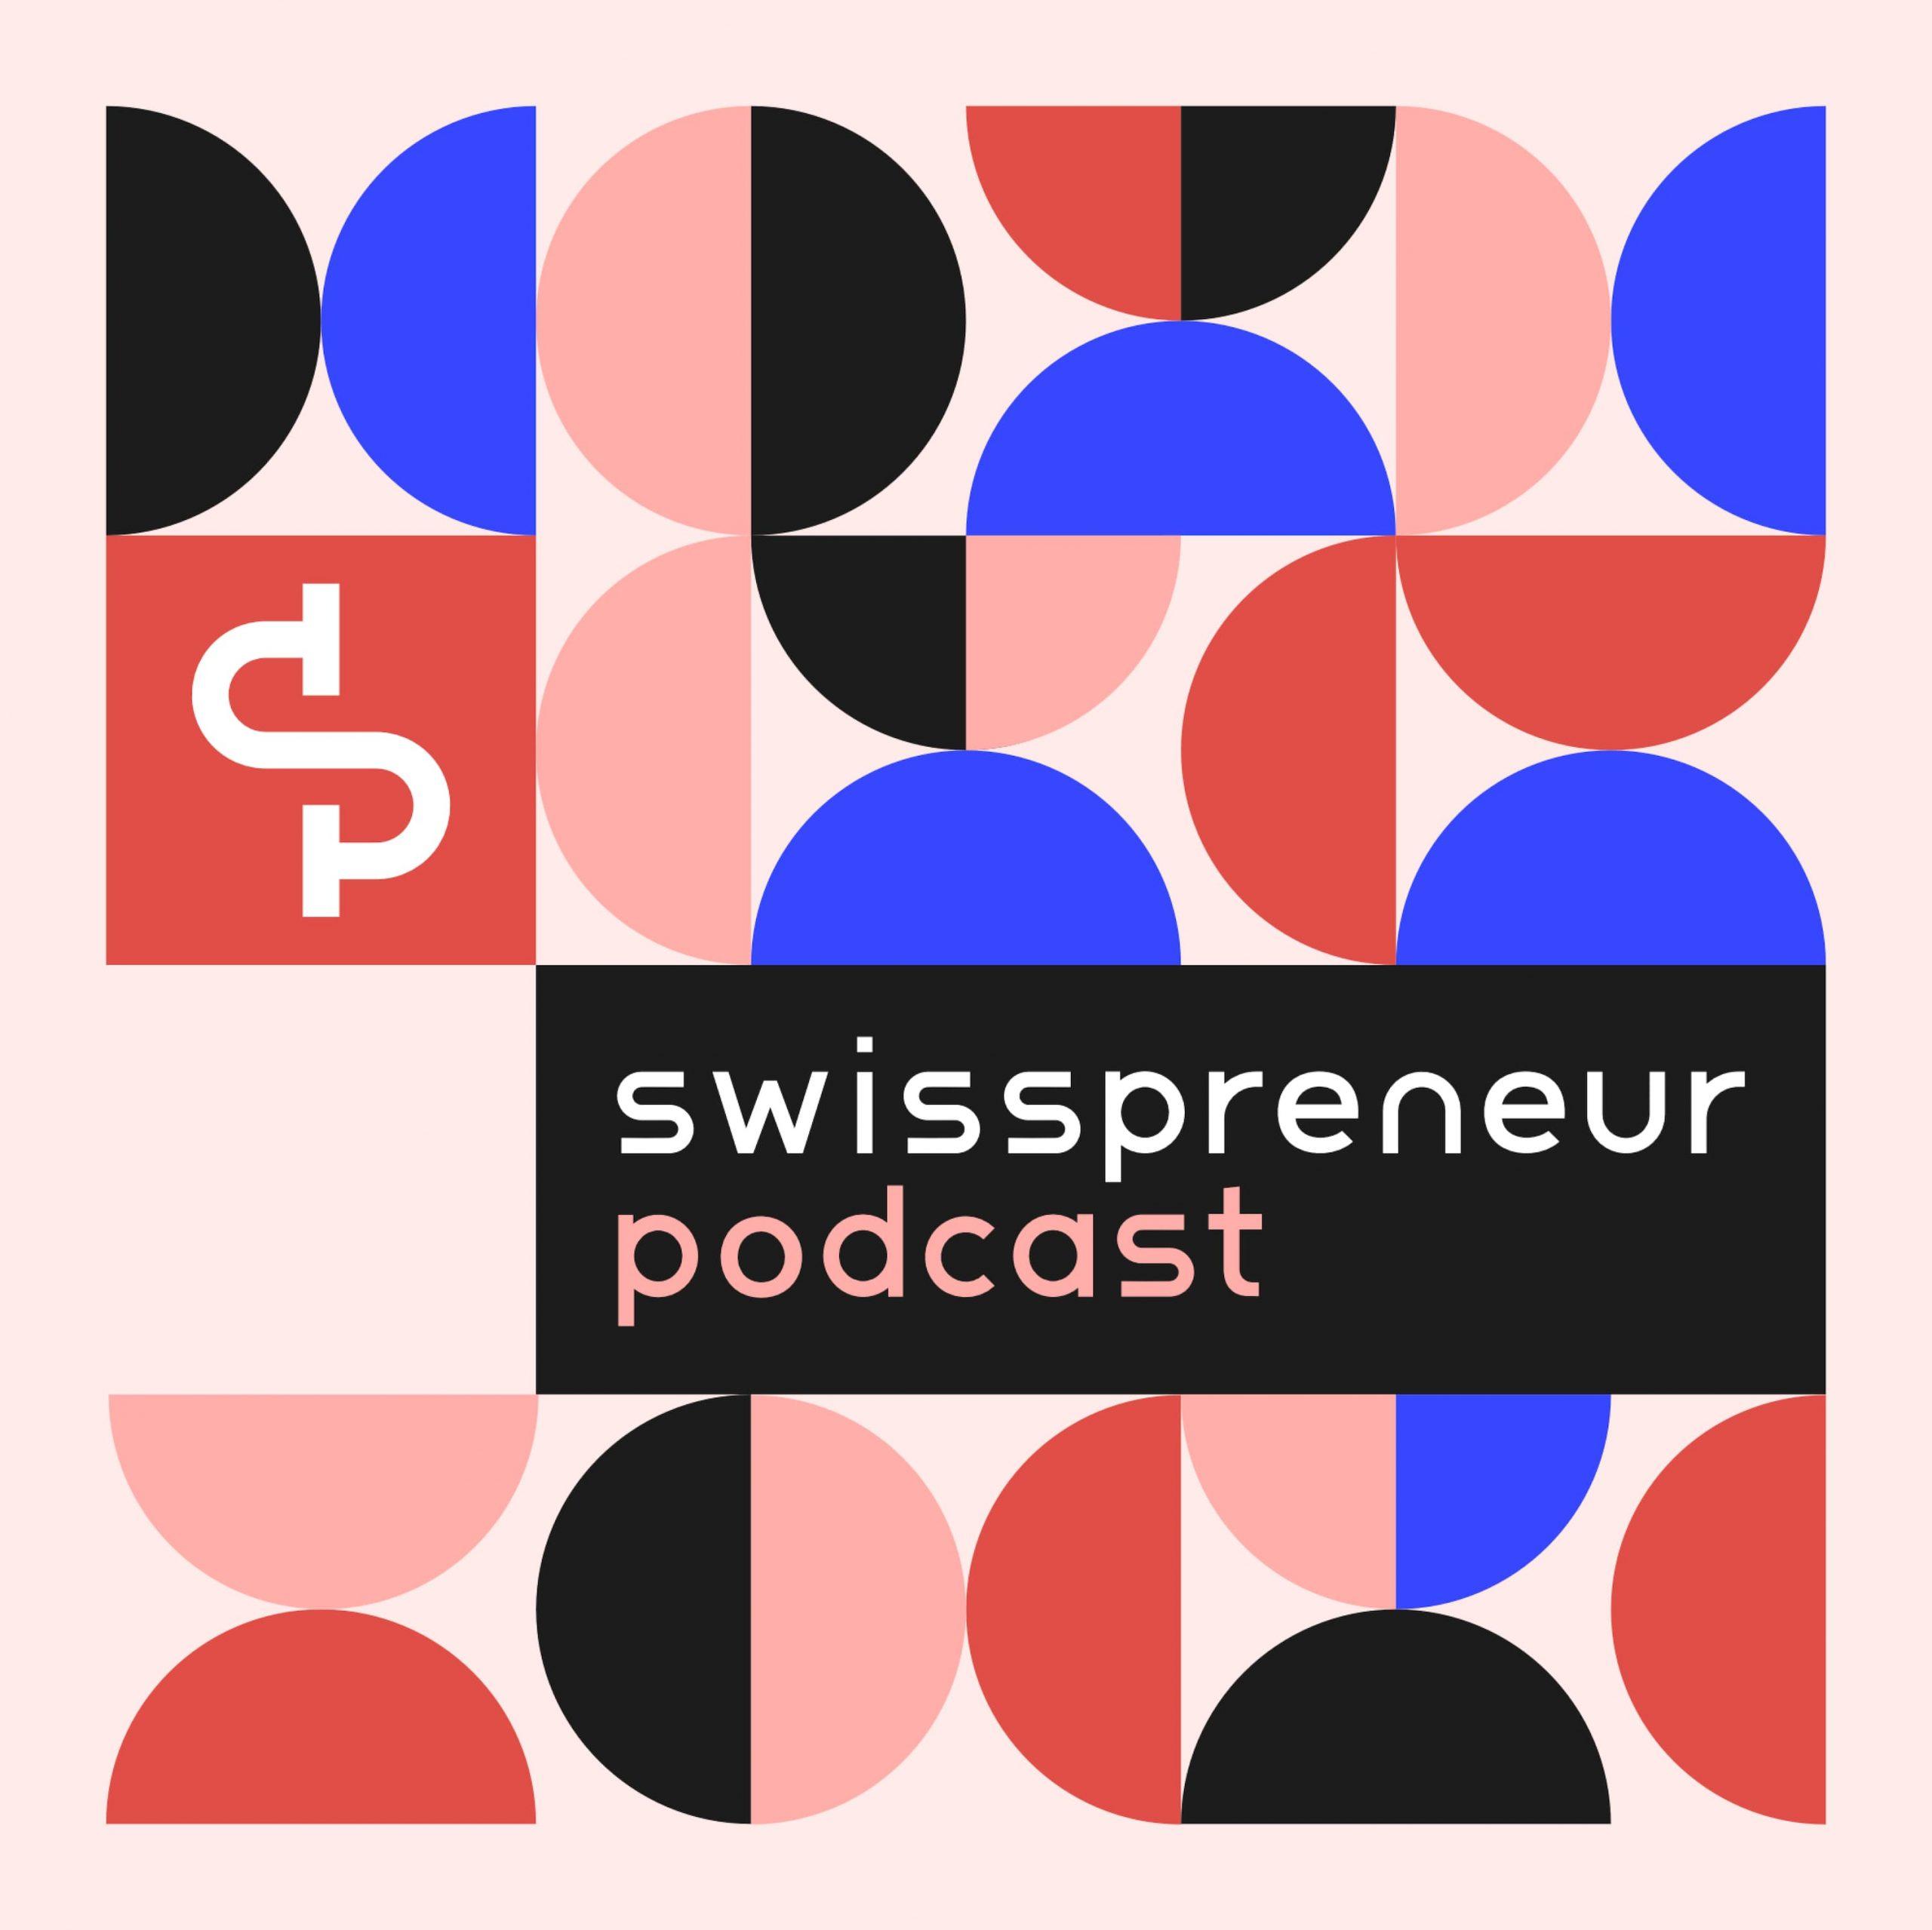 Swisspreneur Podcast Logo